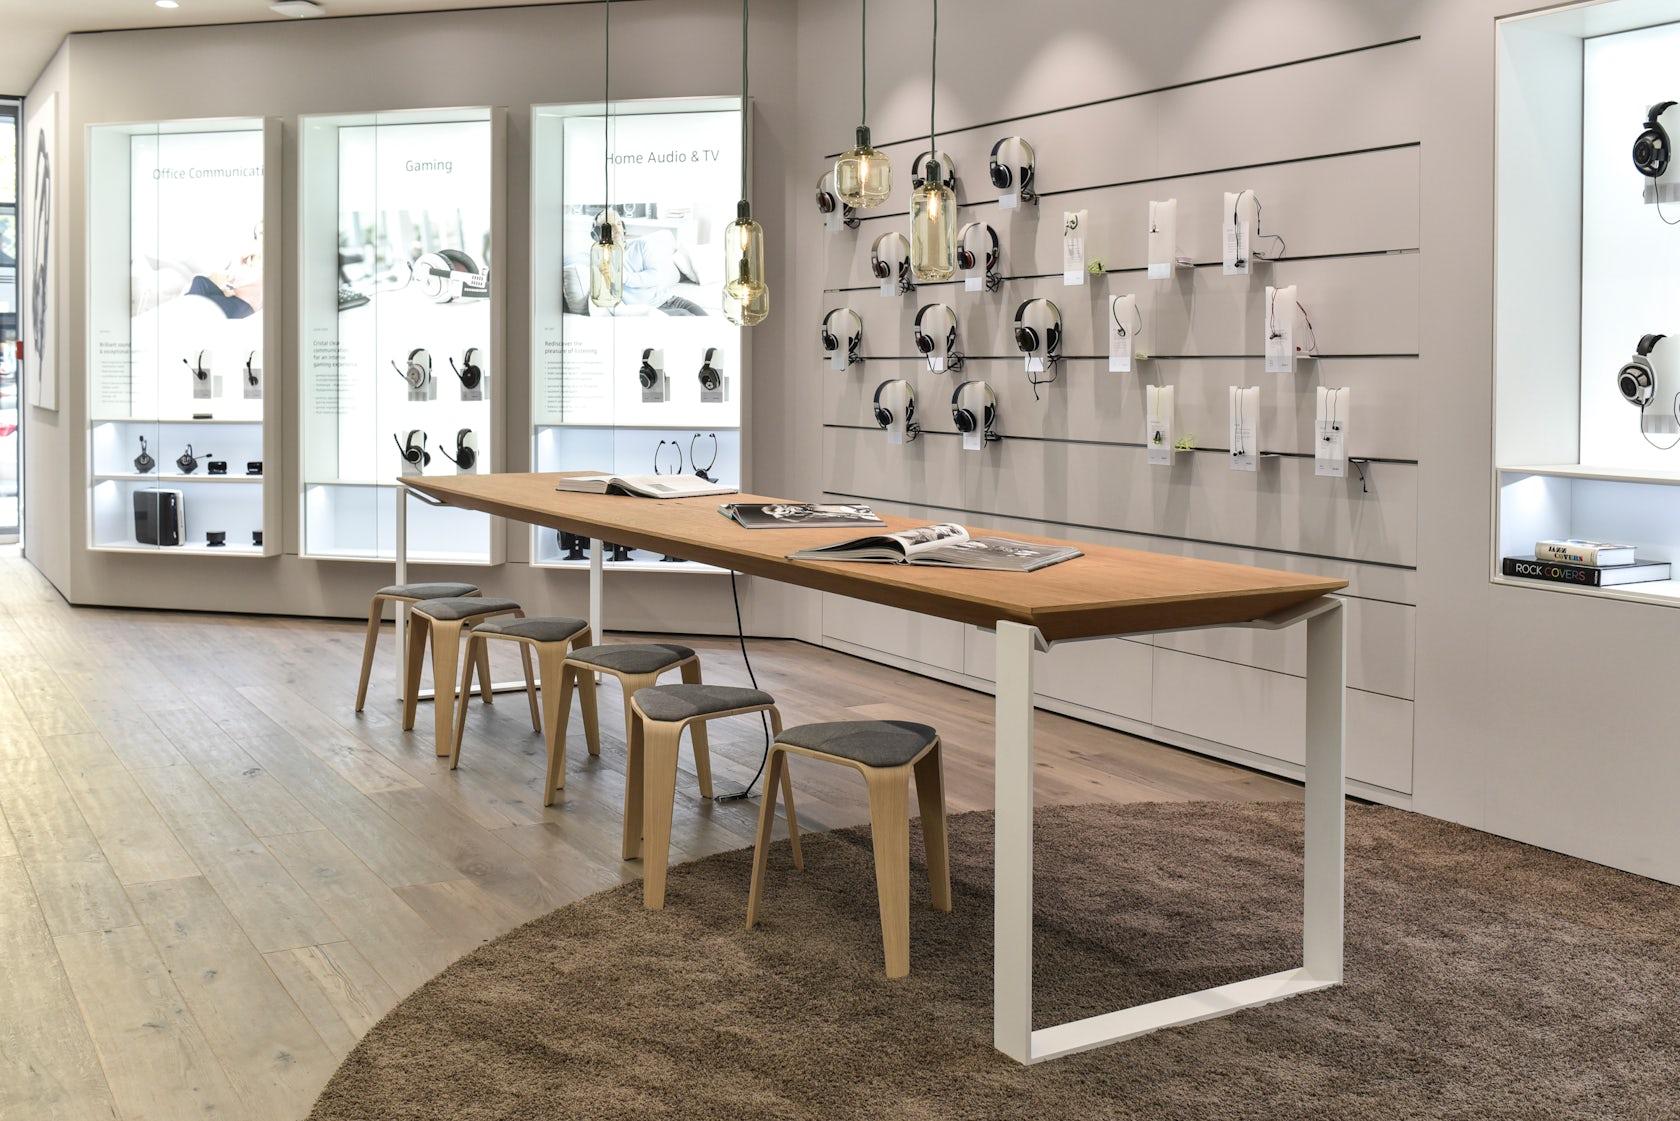 sennheiser store berlin architizer. Black Bedroom Furniture Sets. Home Design Ideas